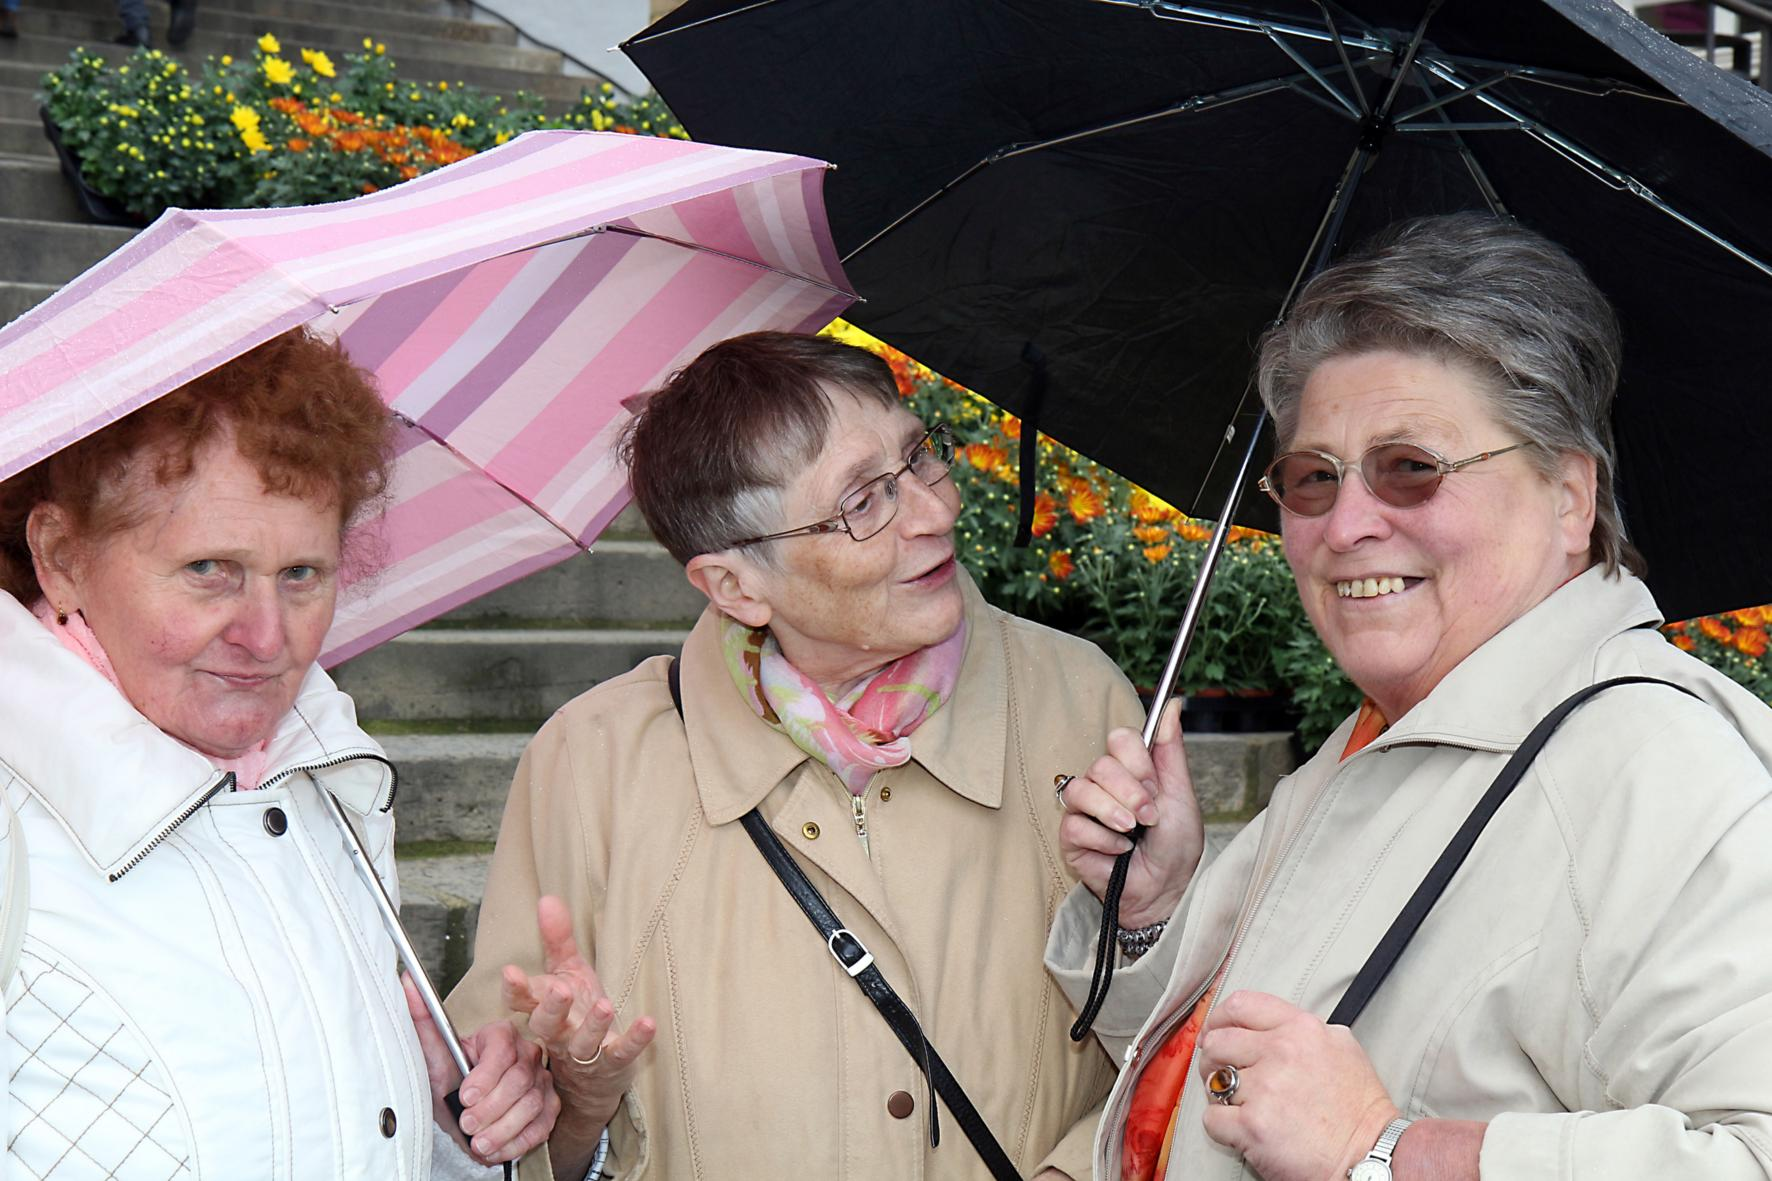 Drei Damen mit Schirm (c) Foto: Peter Weidemann in Pfarrbriefservice.de